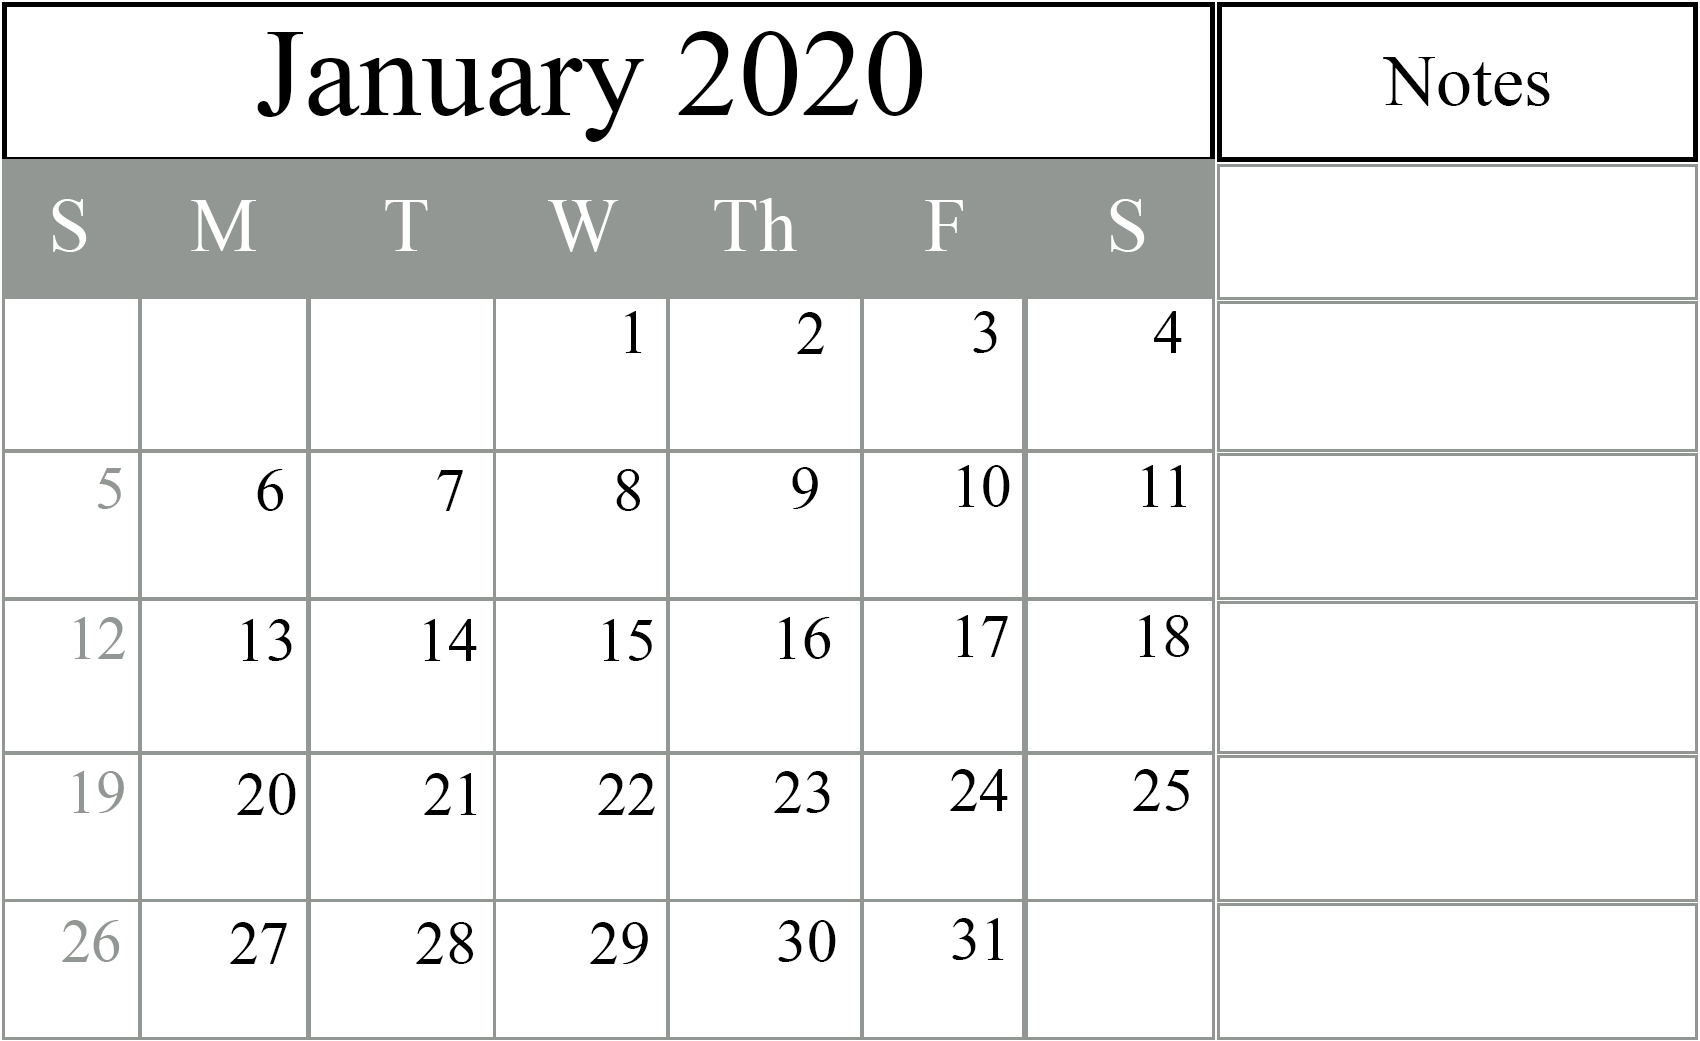 Free January 2020 Printable Calendar In Pdf, Excel & Word within Free Printable 2020 Calendar With Space To Write